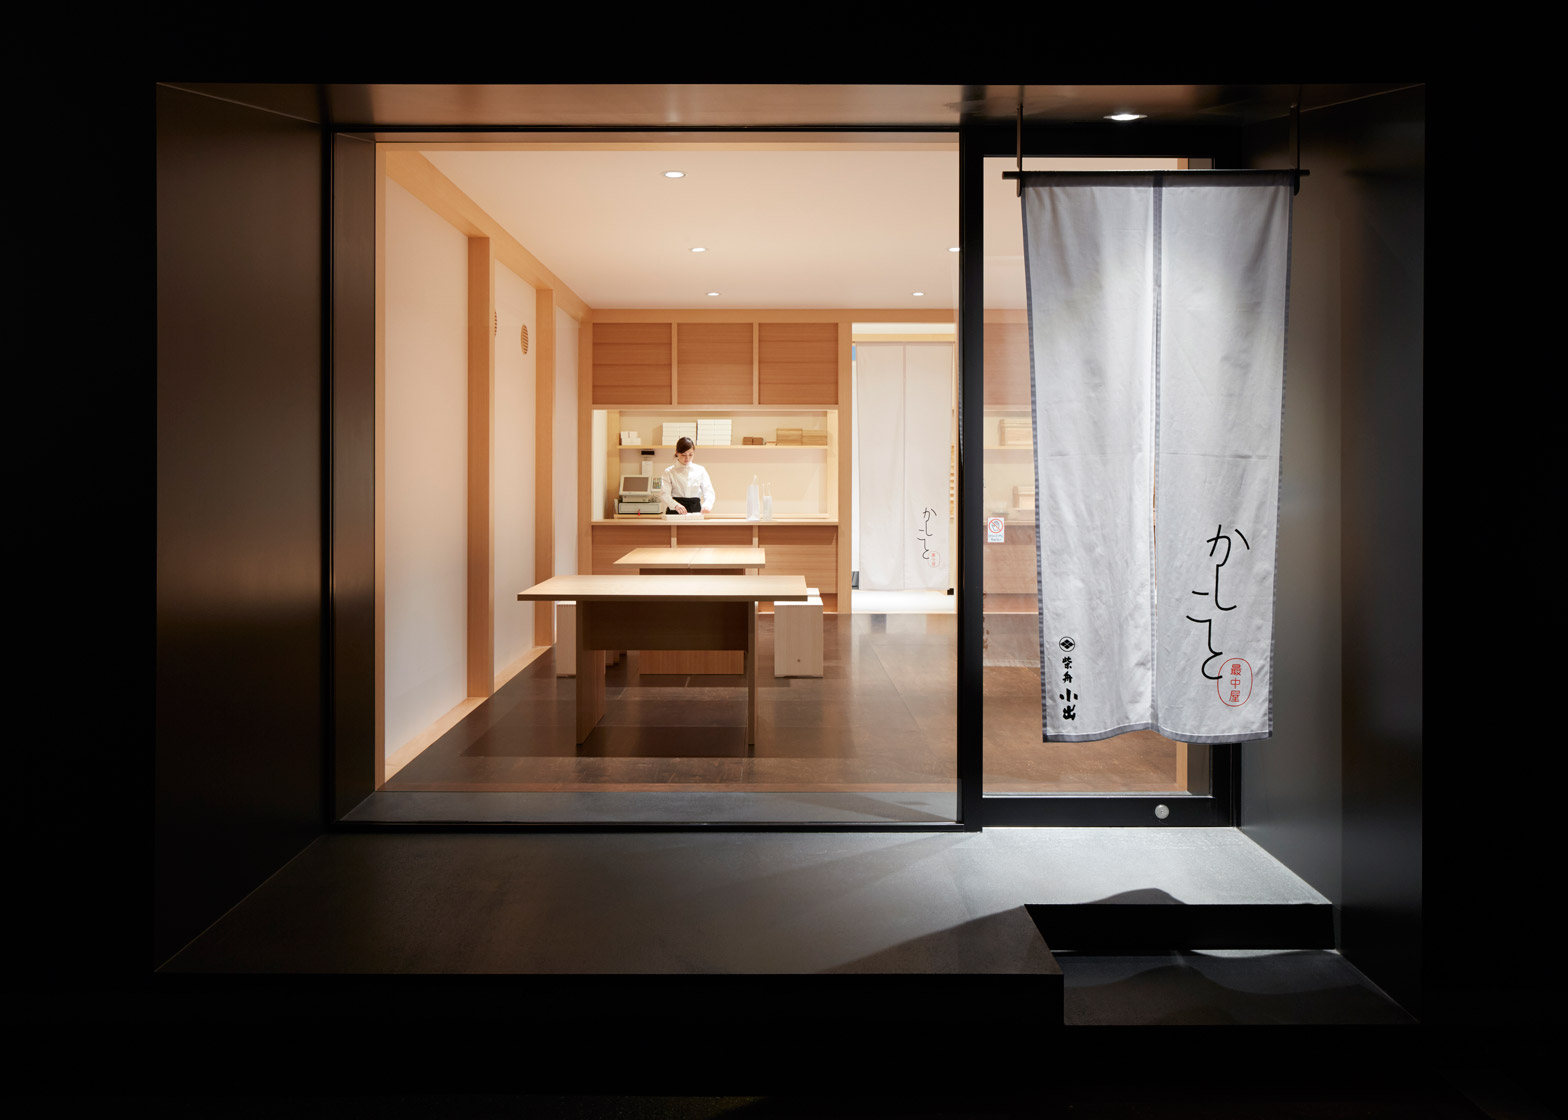 Shibafune-Koide by Wataru Kumano